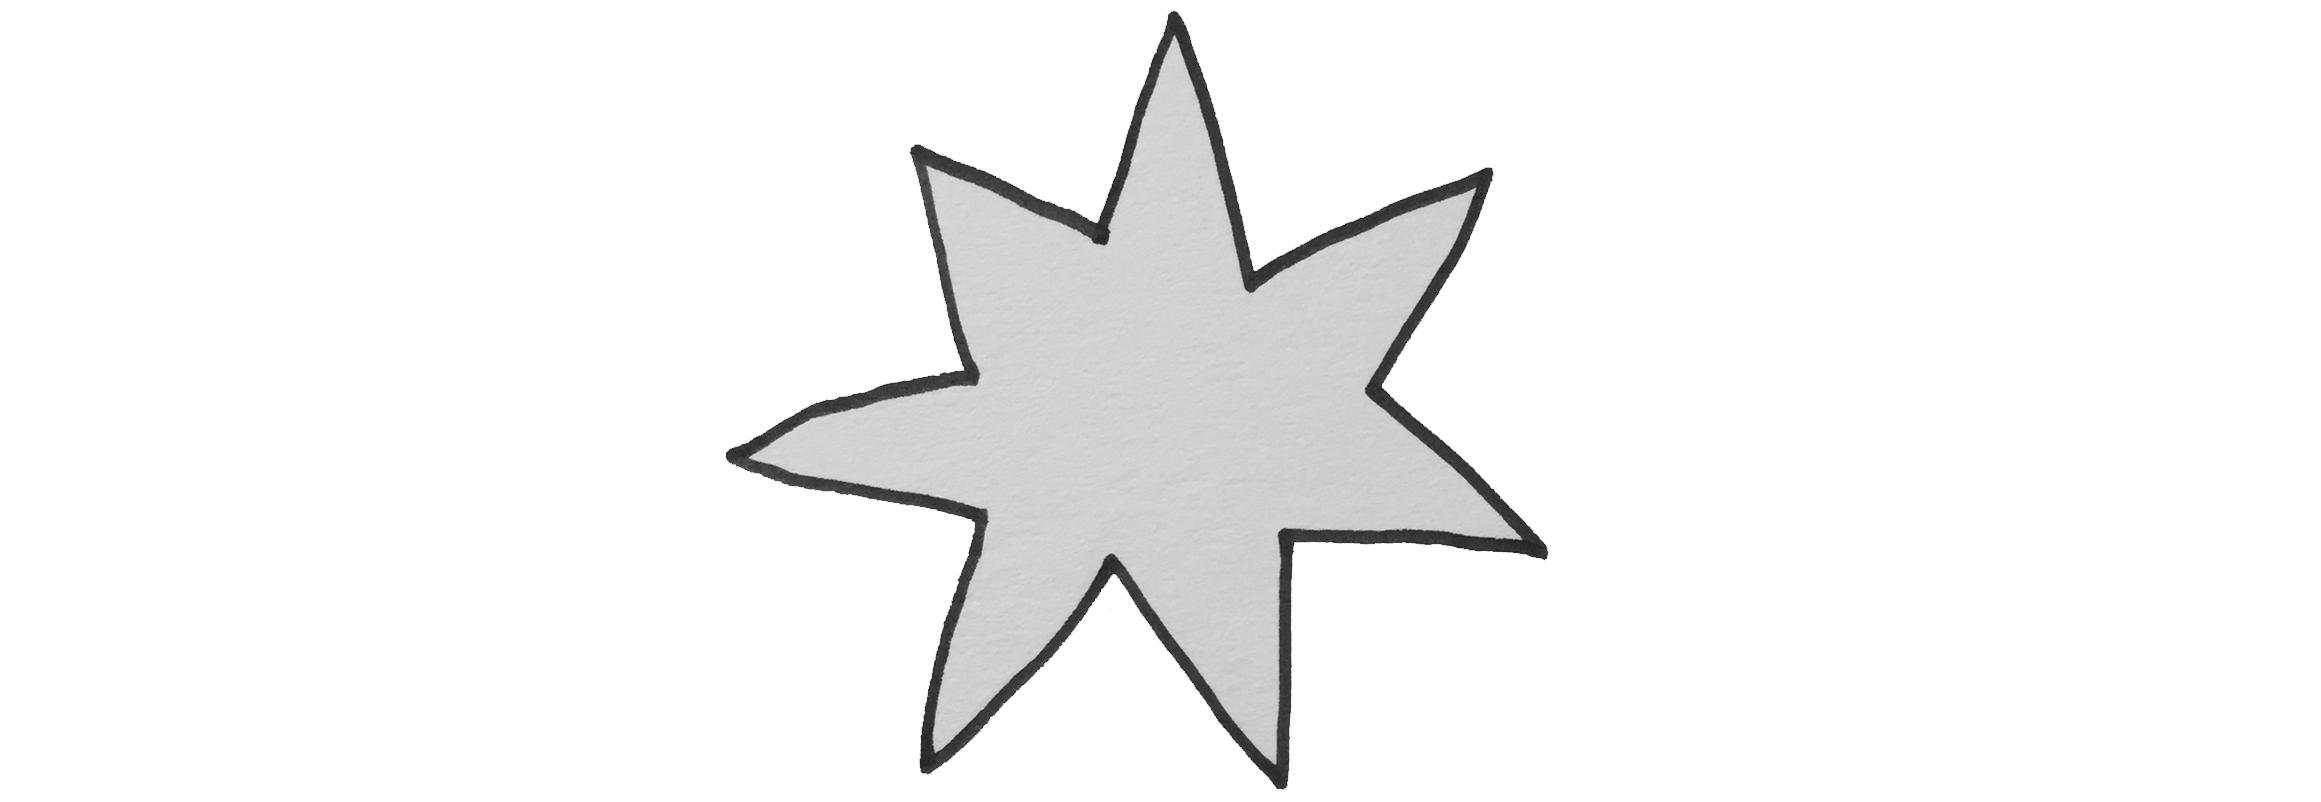 BigStar.png